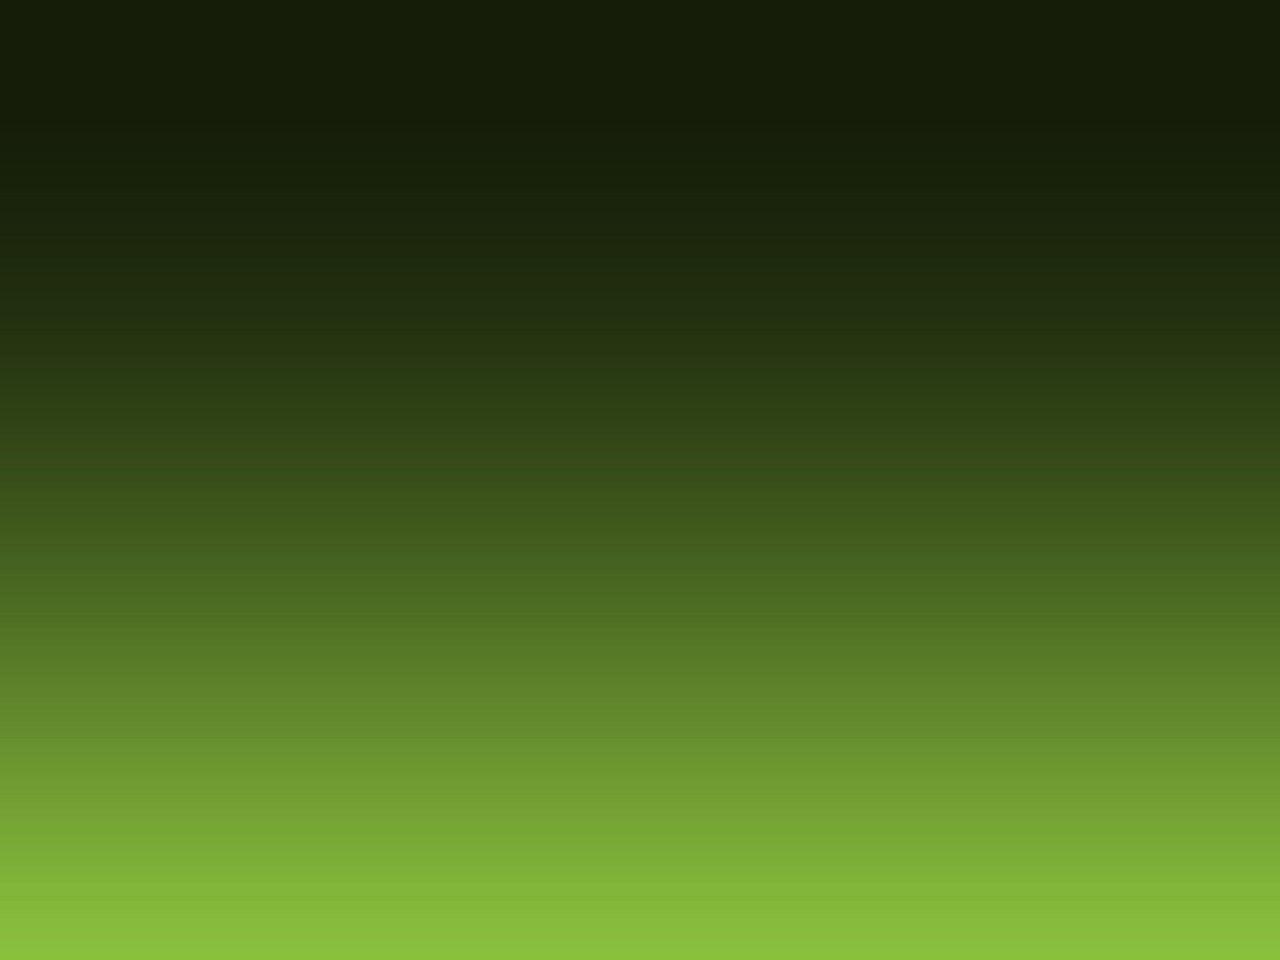 green-gradient.jpg